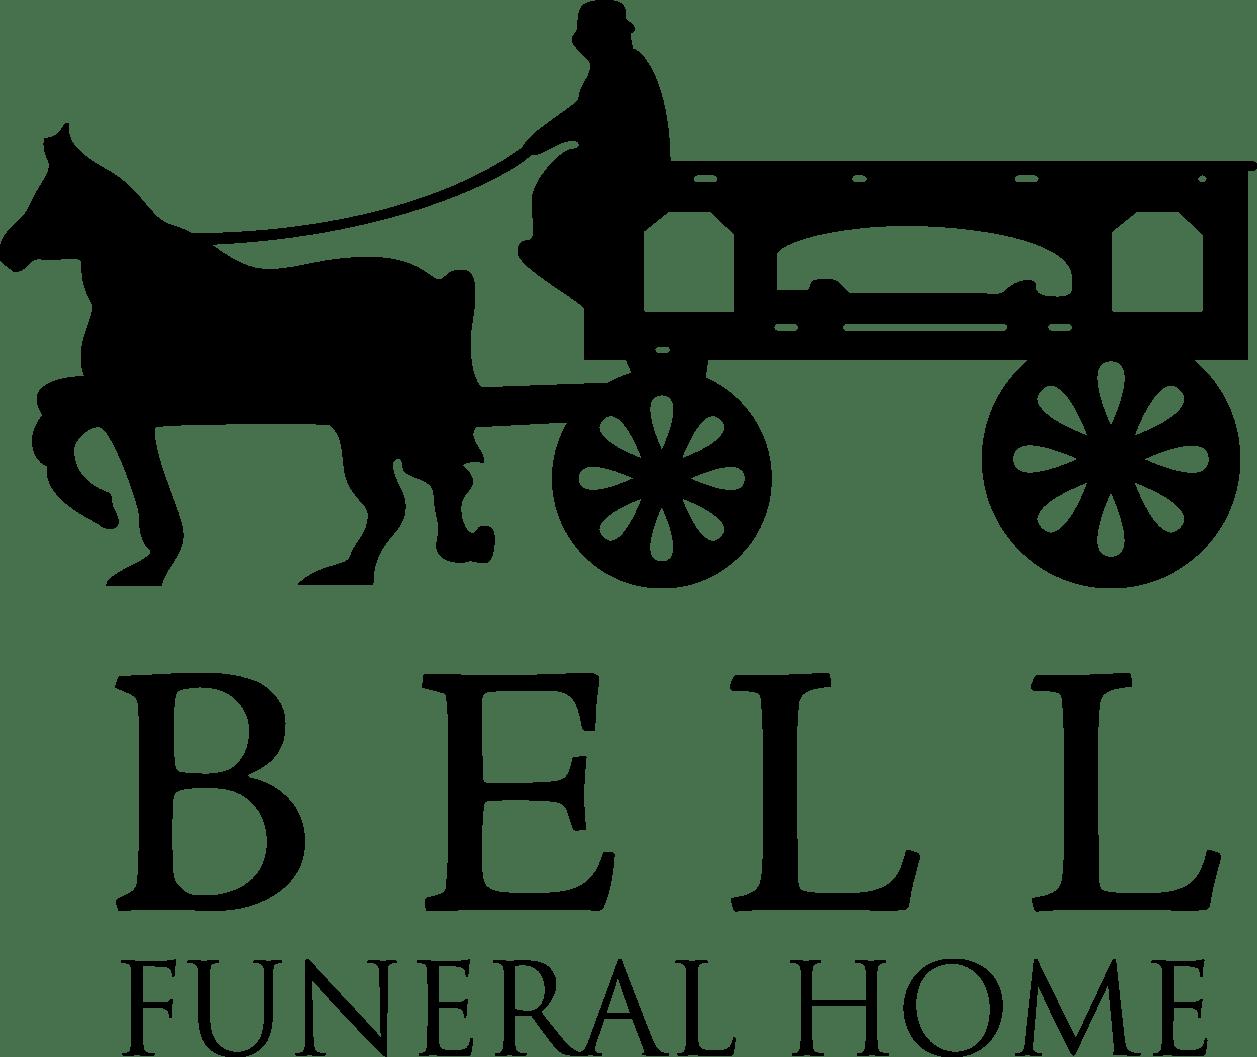 Funeral clipart funeral car, Funeral funeral car